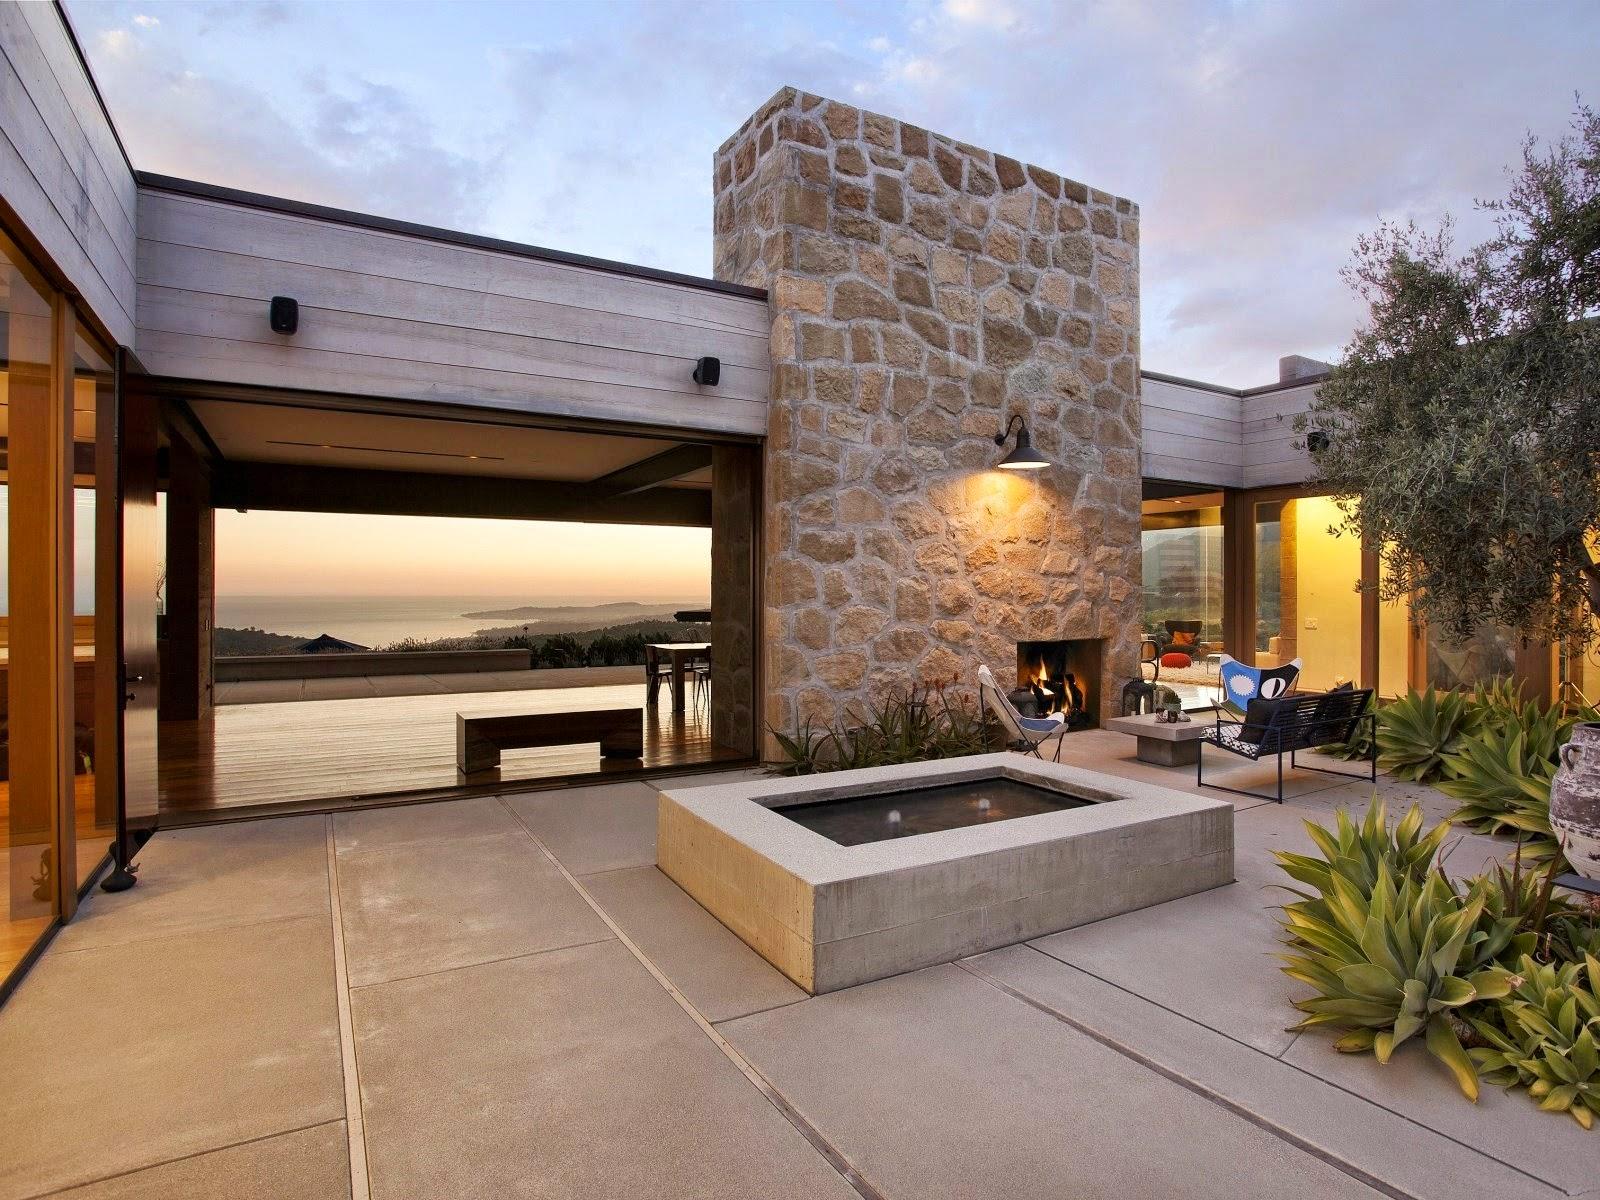 Cococozy 13 Million Dollar Montecito Modern Home For Sale